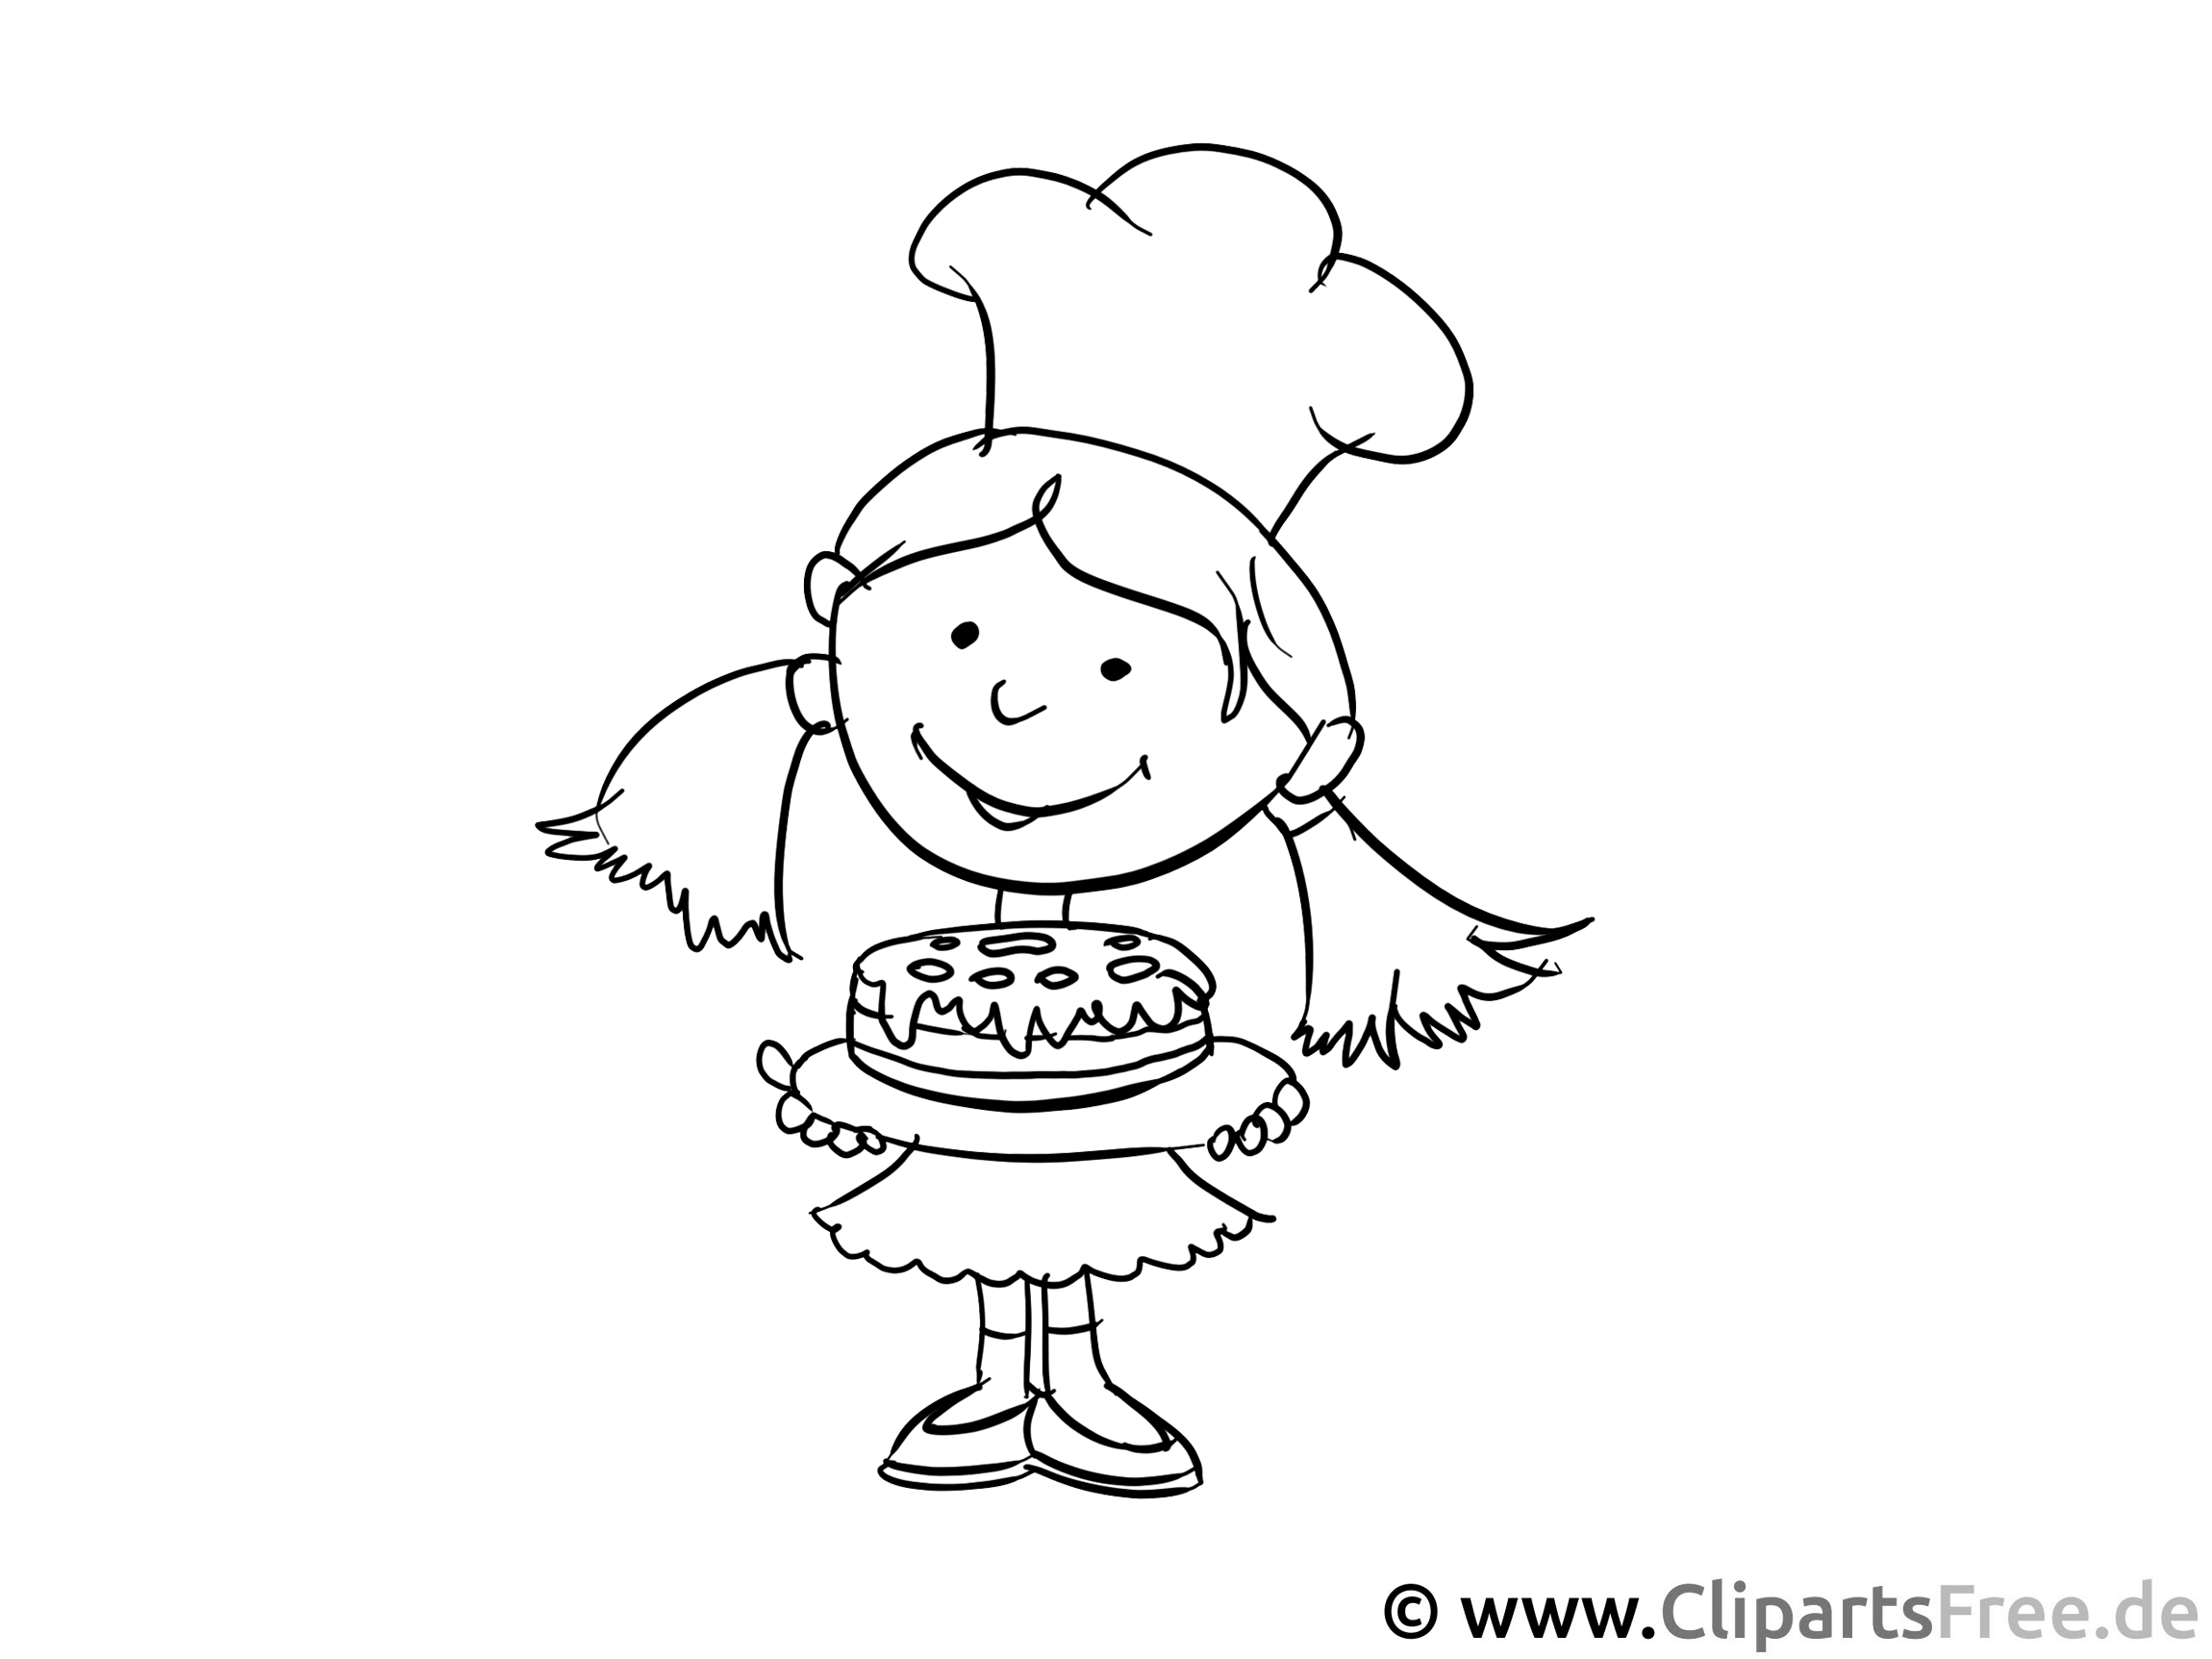 Azubi in Bäckerei - Ausmalbilder Berufe zum Ausdrucken